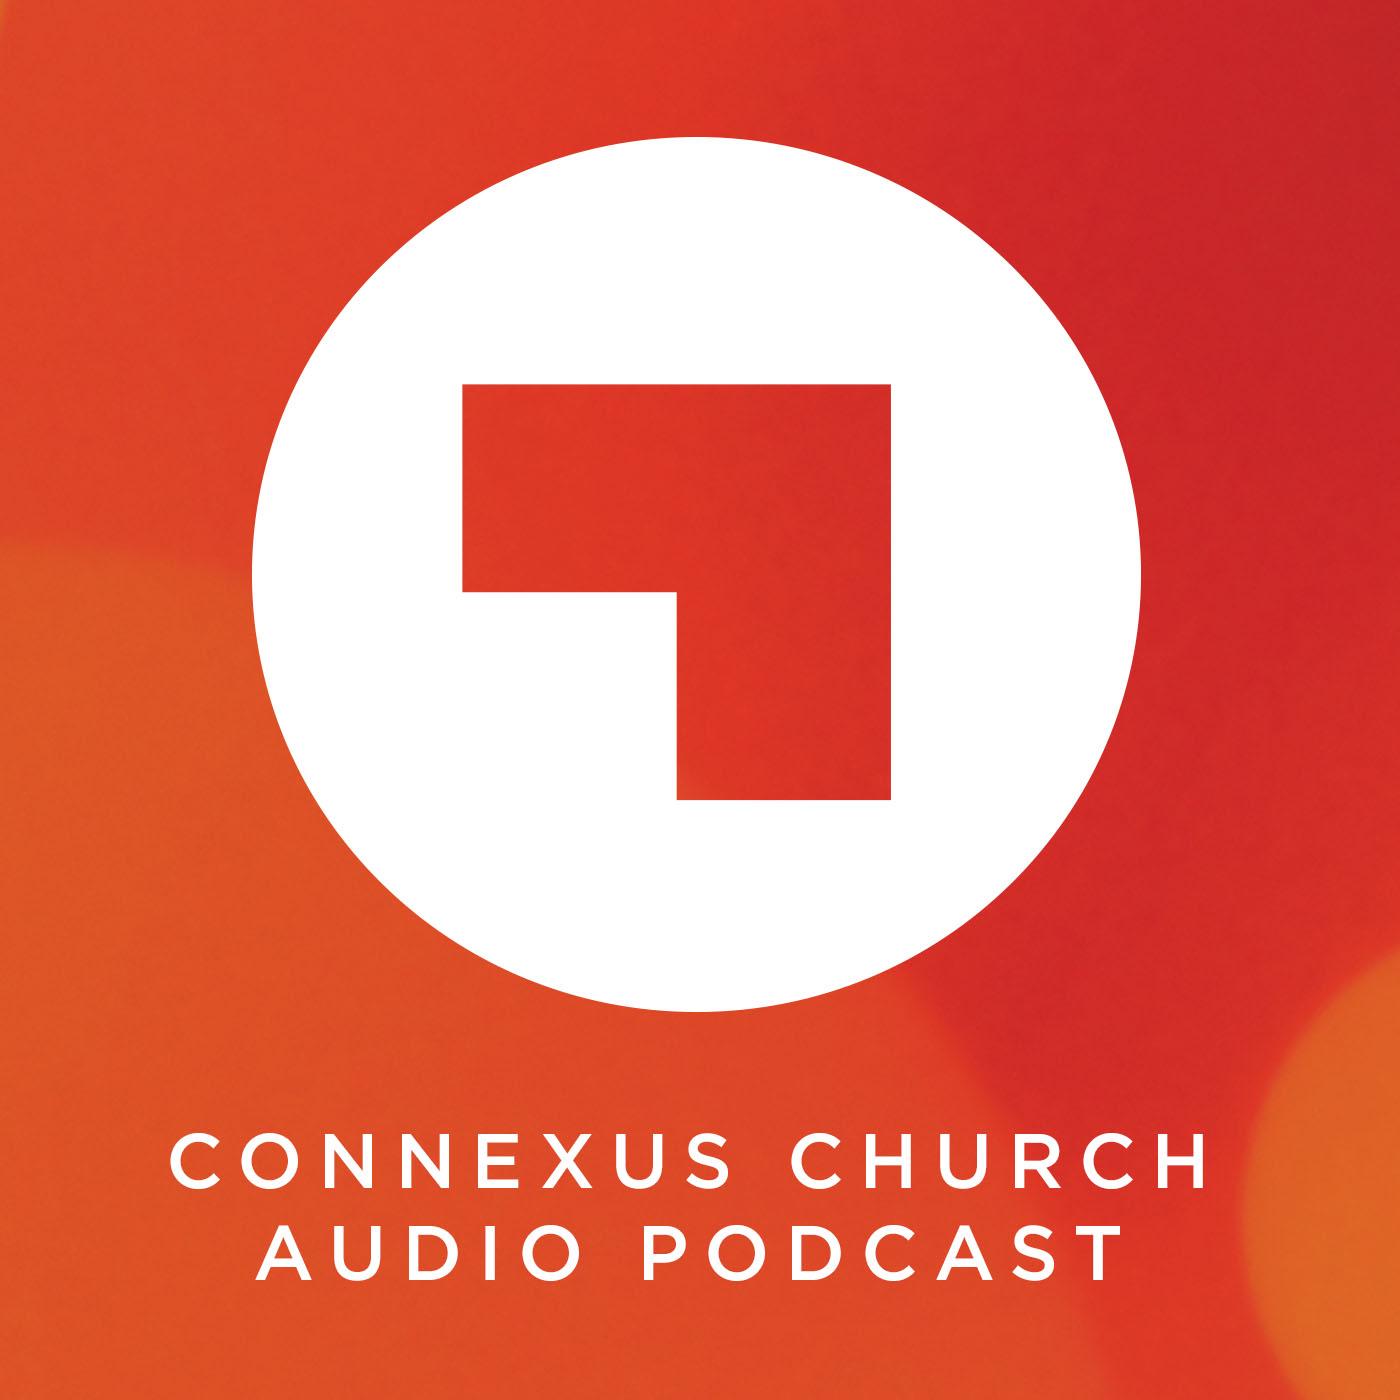 Connexus Church Audio Podcast show art